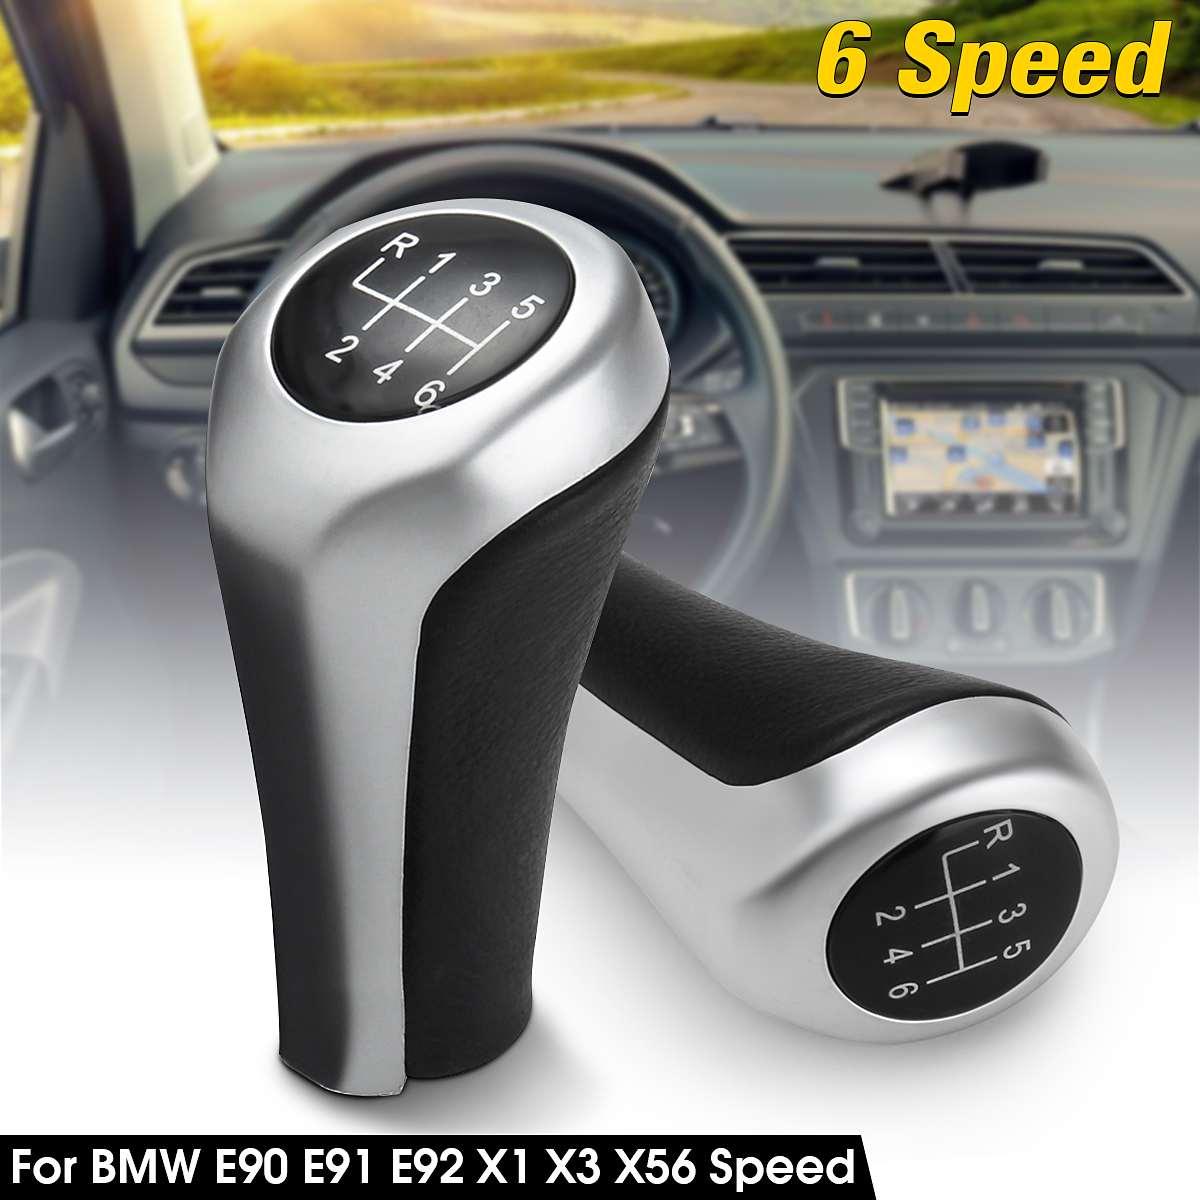 Us 7 74 8 Off Car 6 Speed Gear Shift Knob Shifter Knob For Bmw E46 E90 E91 E92 X1 X3 X5 In Gear Shift Knob From Automobiles Motorcycles On